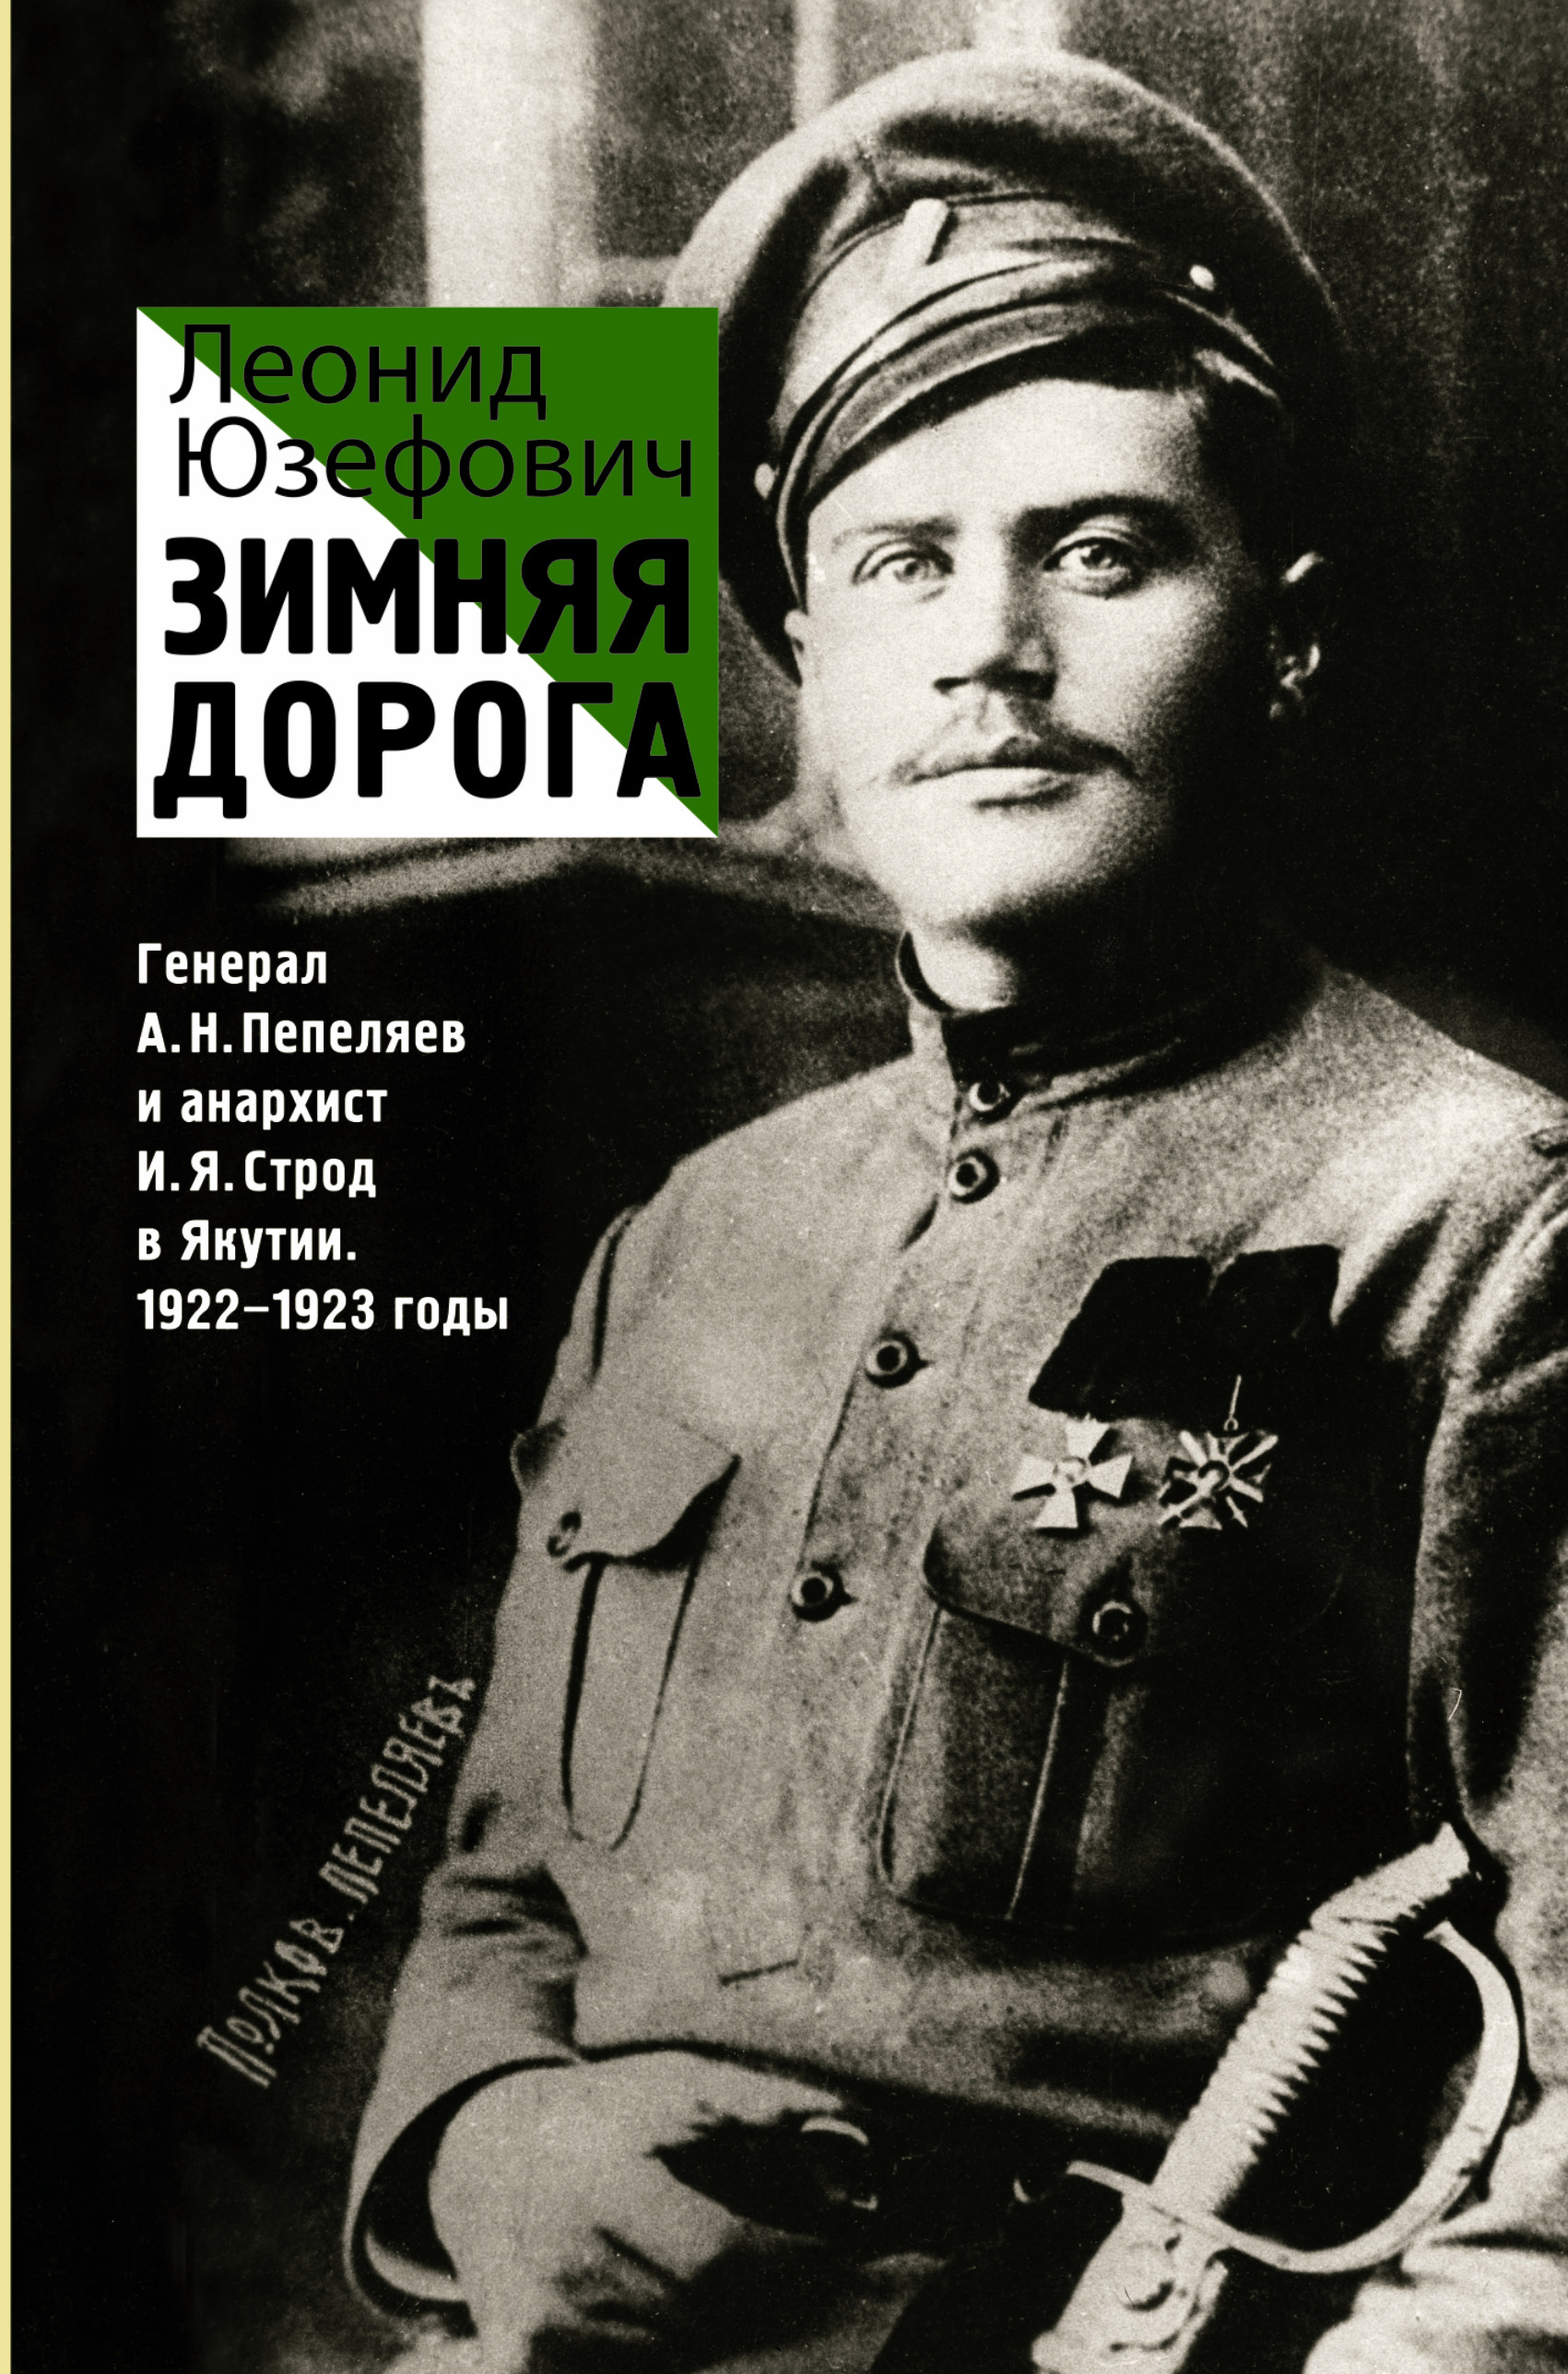 Юзефович Леонид Абрамович Зимняя дорога